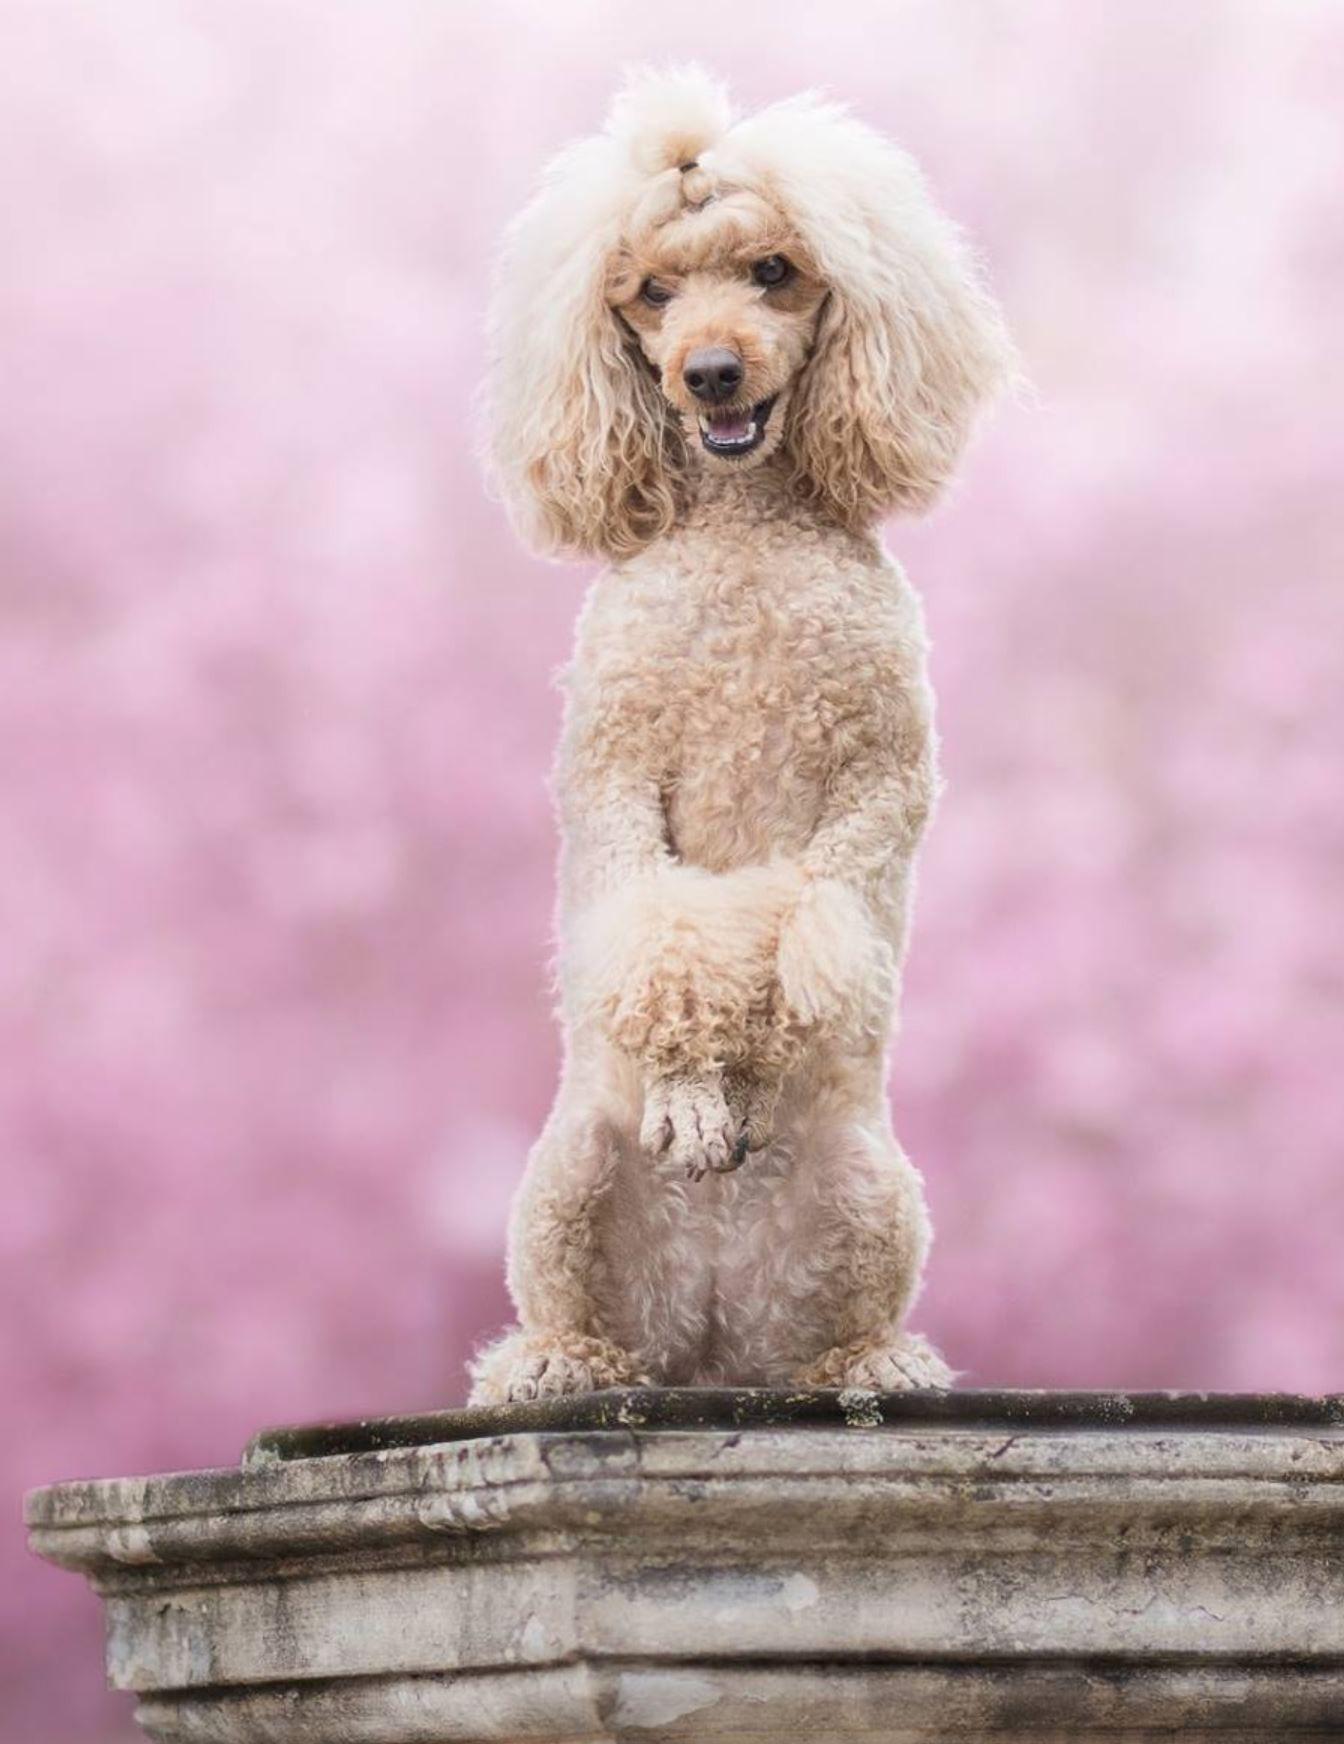 Toy Poodle Puppy Dog Poodle Puppy Poodle Dog Toy Puppies